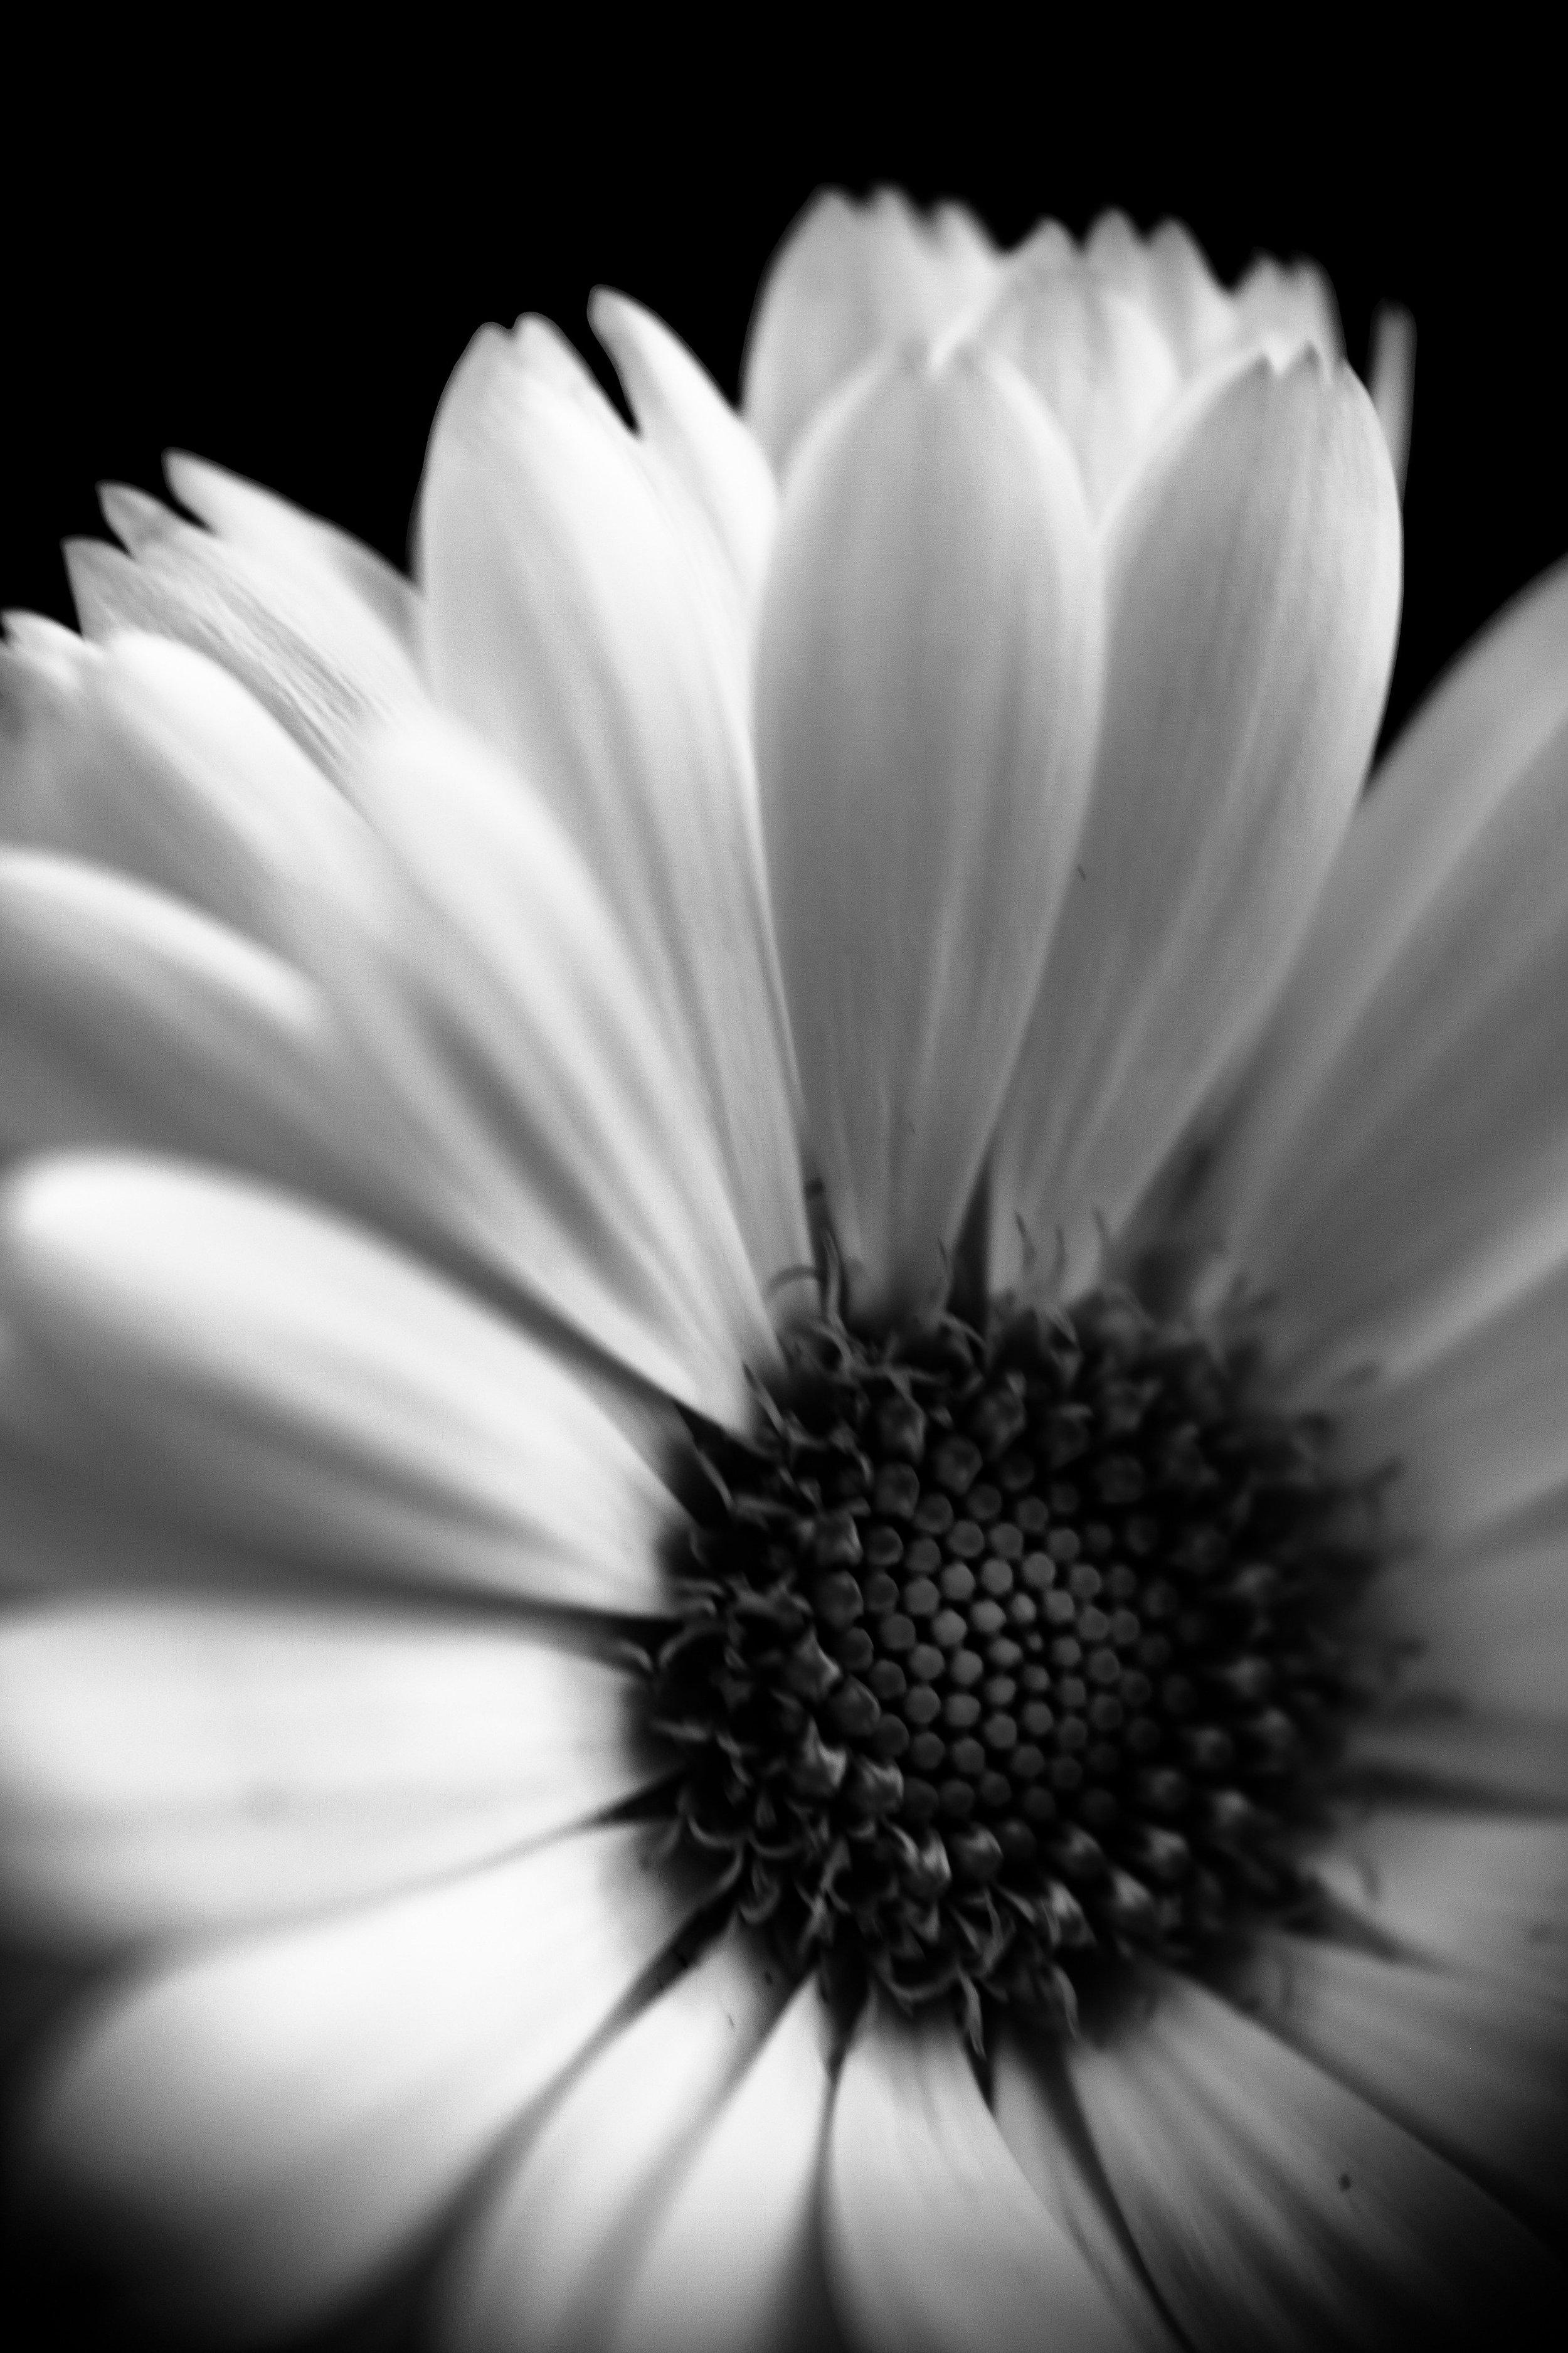 macro_photography_31.jpg